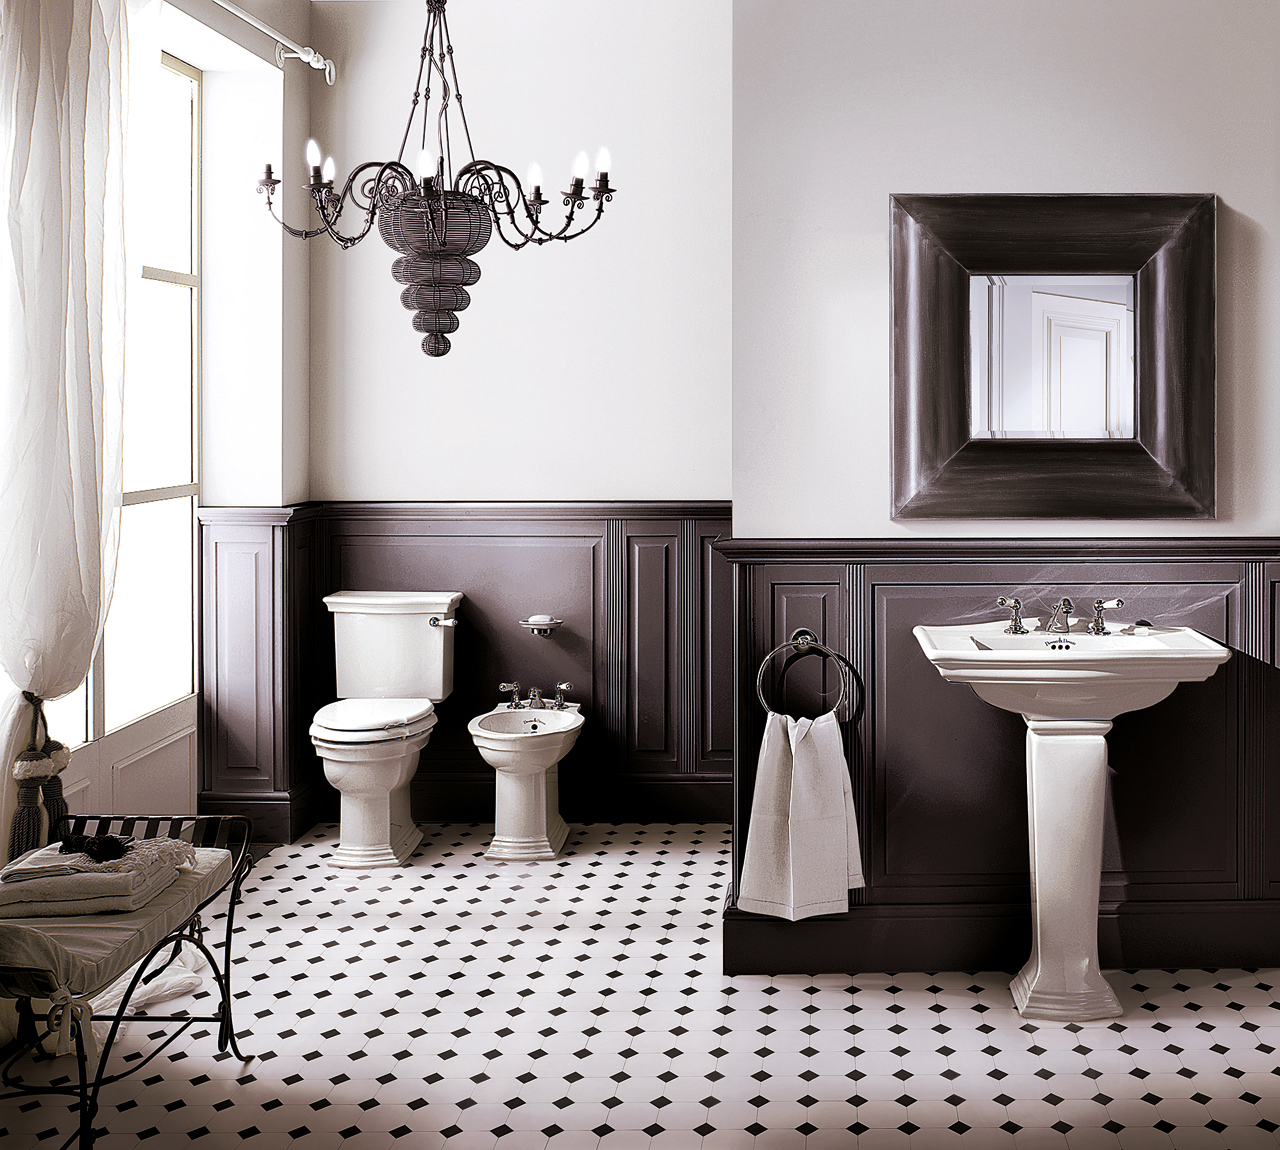 Classic Bathrooms: Devon & Devon: Linea-Westminster